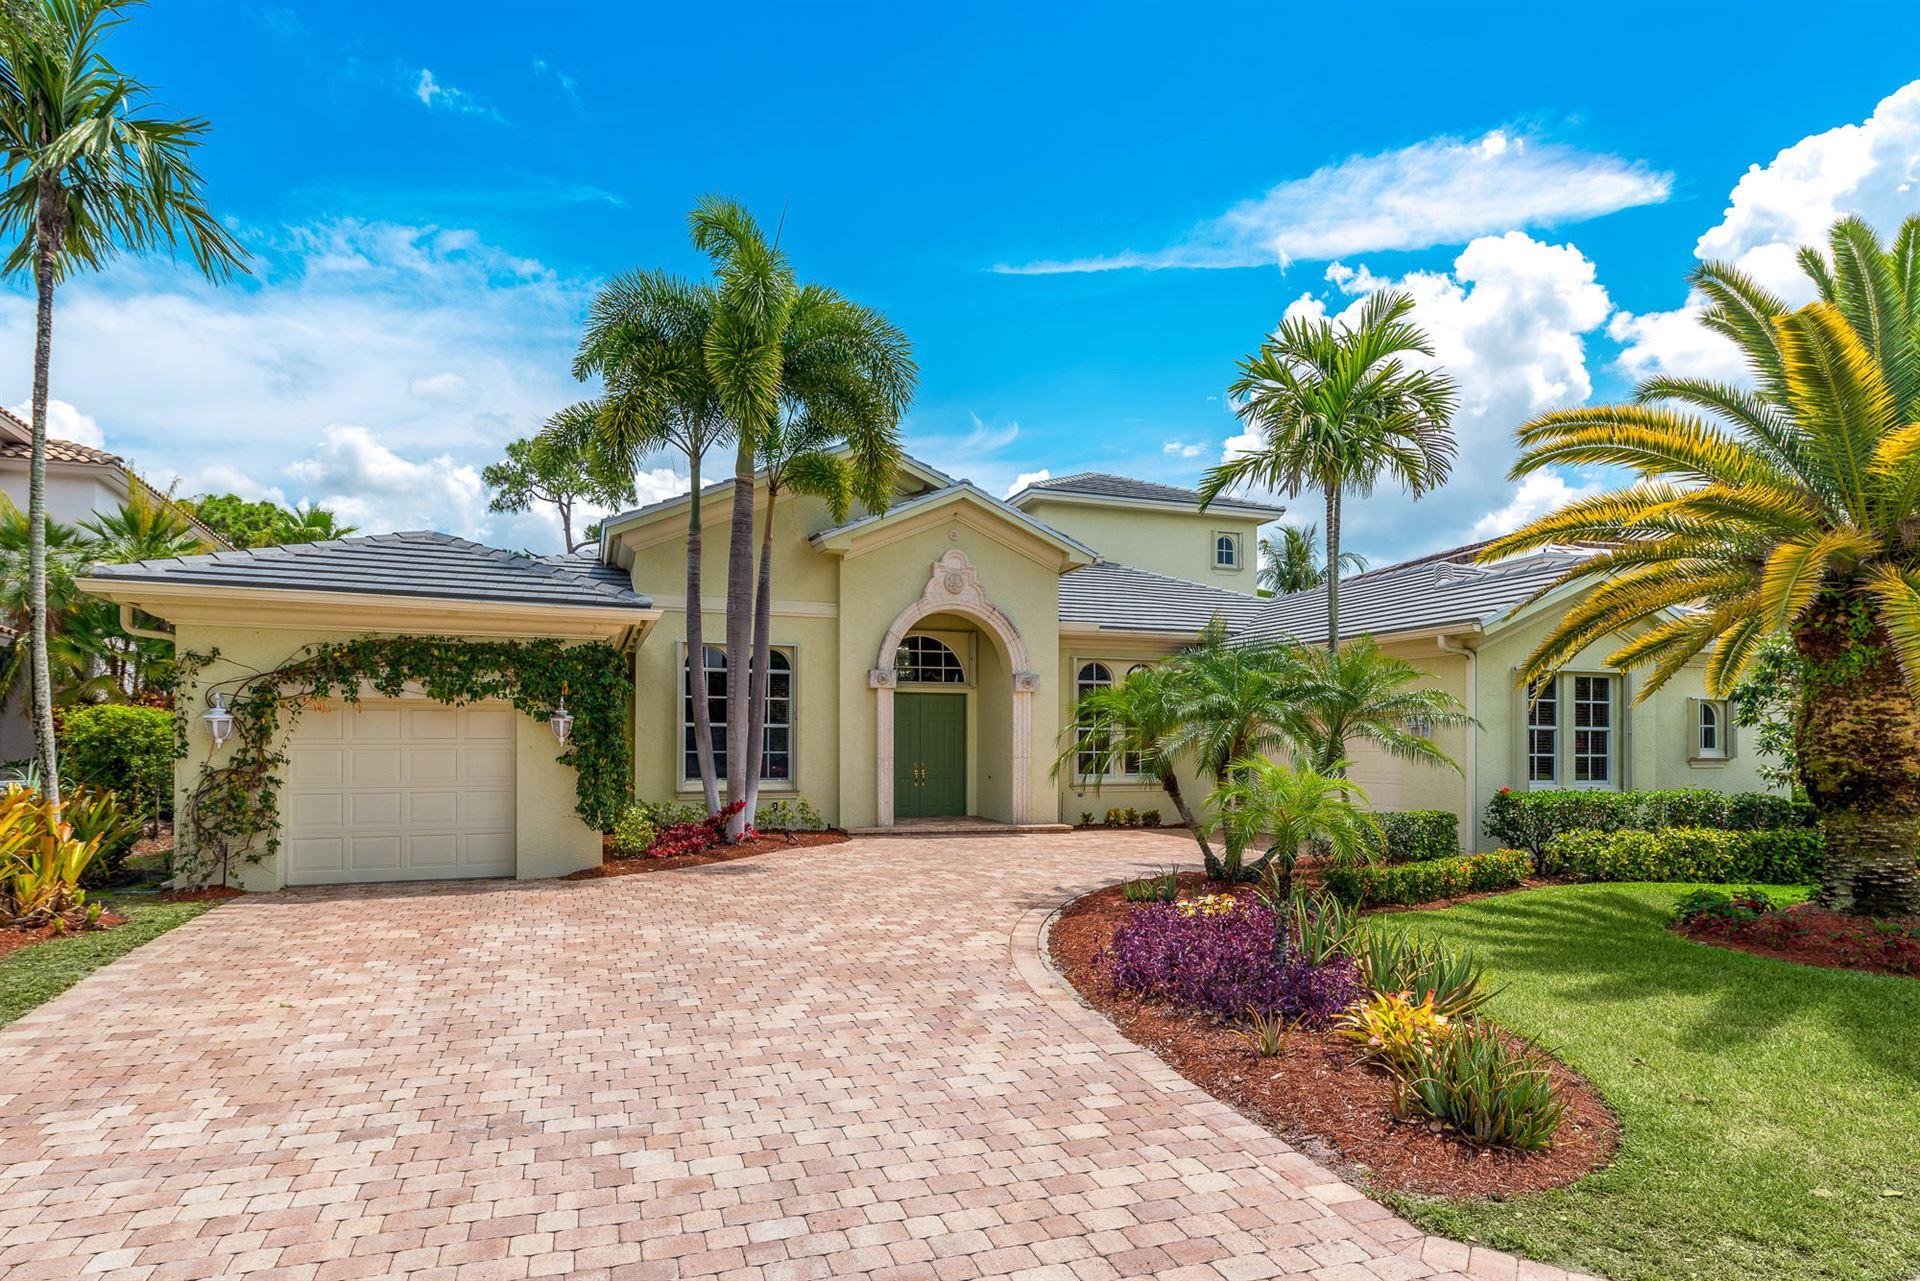 307 SW Harbor View Drive, Palm City, FL 34990 - MLS#: RX-10716461